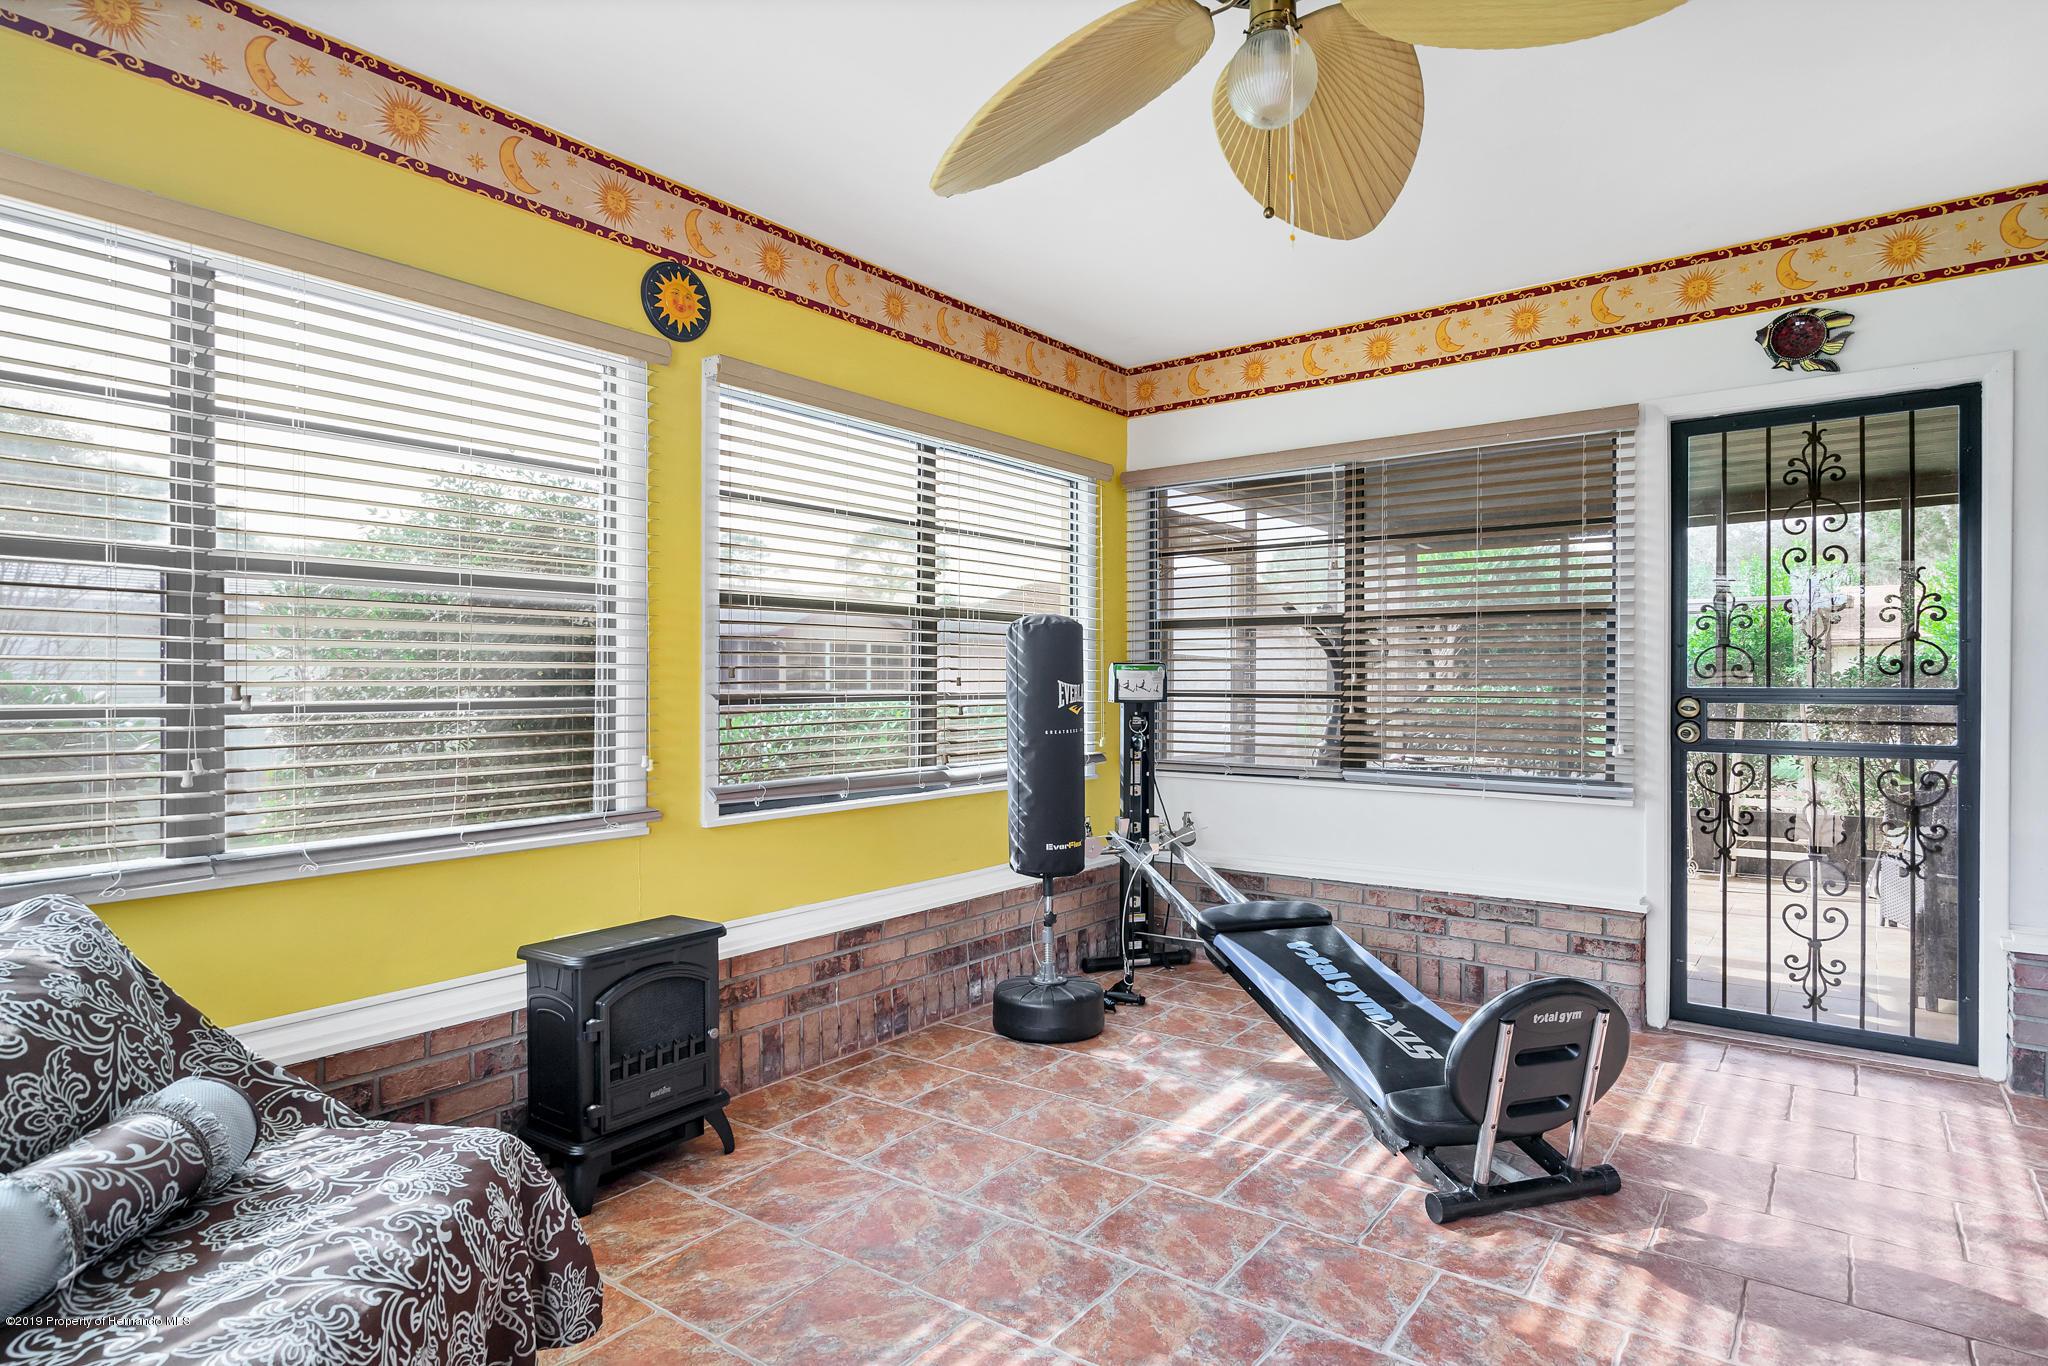 5575 Fairway Drive, Ridge Manor, Florida 33523, 3 Bedrooms Bedrooms, ,2 BathroomsBathrooms,Residential,For Sale,Fairway,2197986